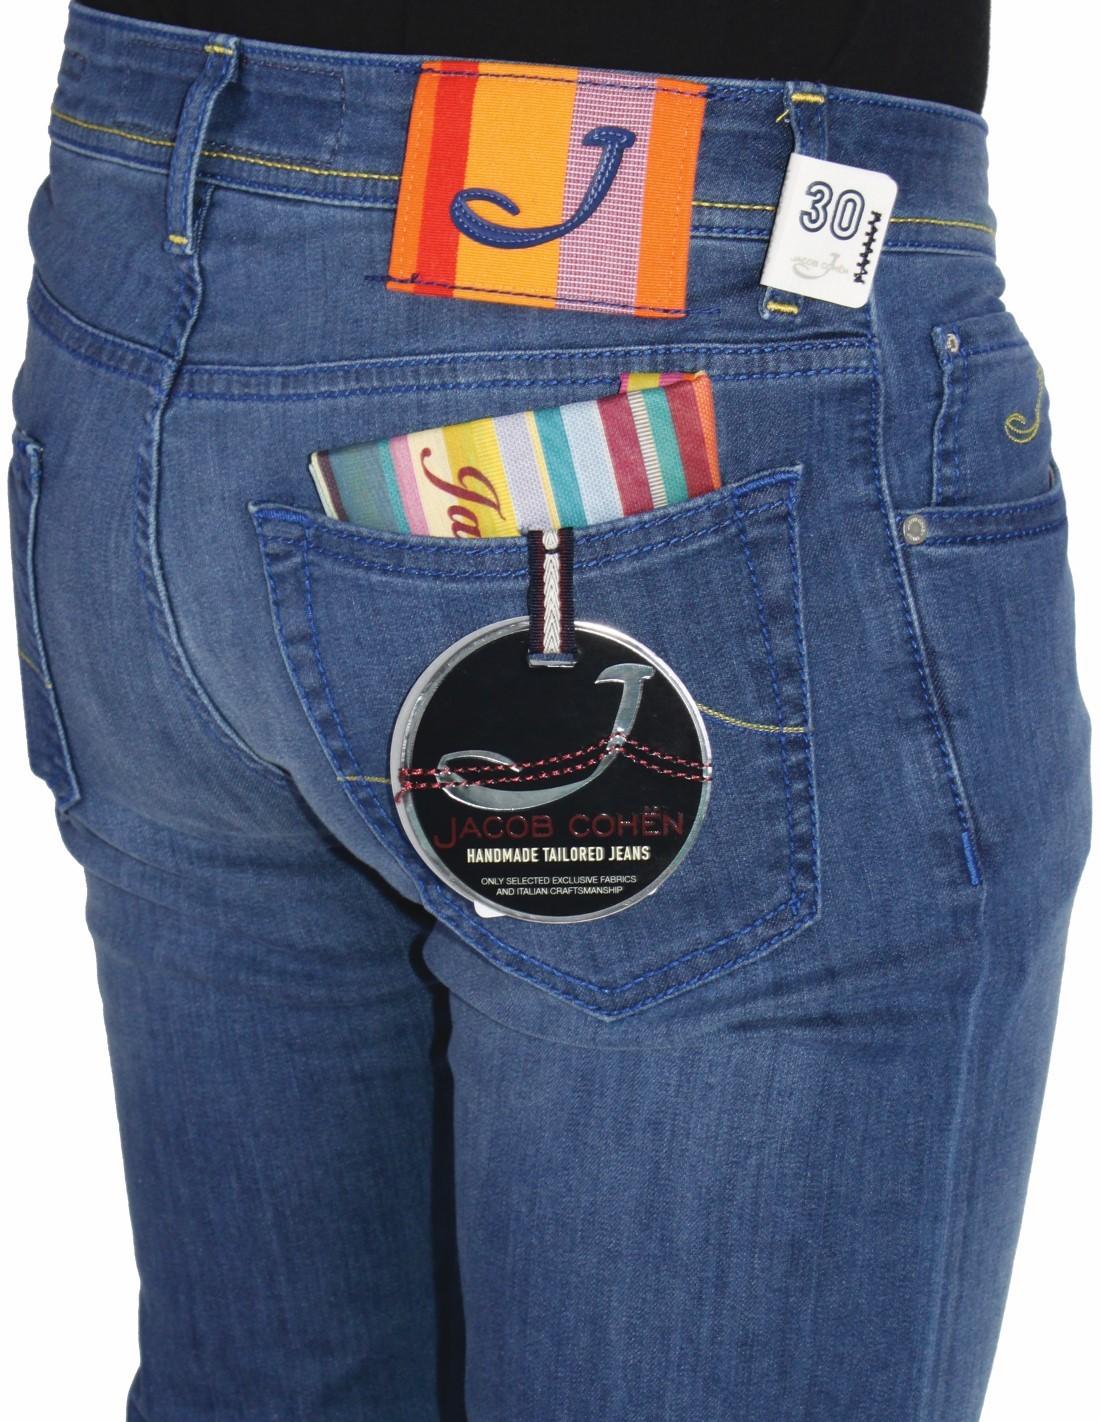 nuovo prodotto 82079 05364 Jacob Cohen 622 Luxury Jeans